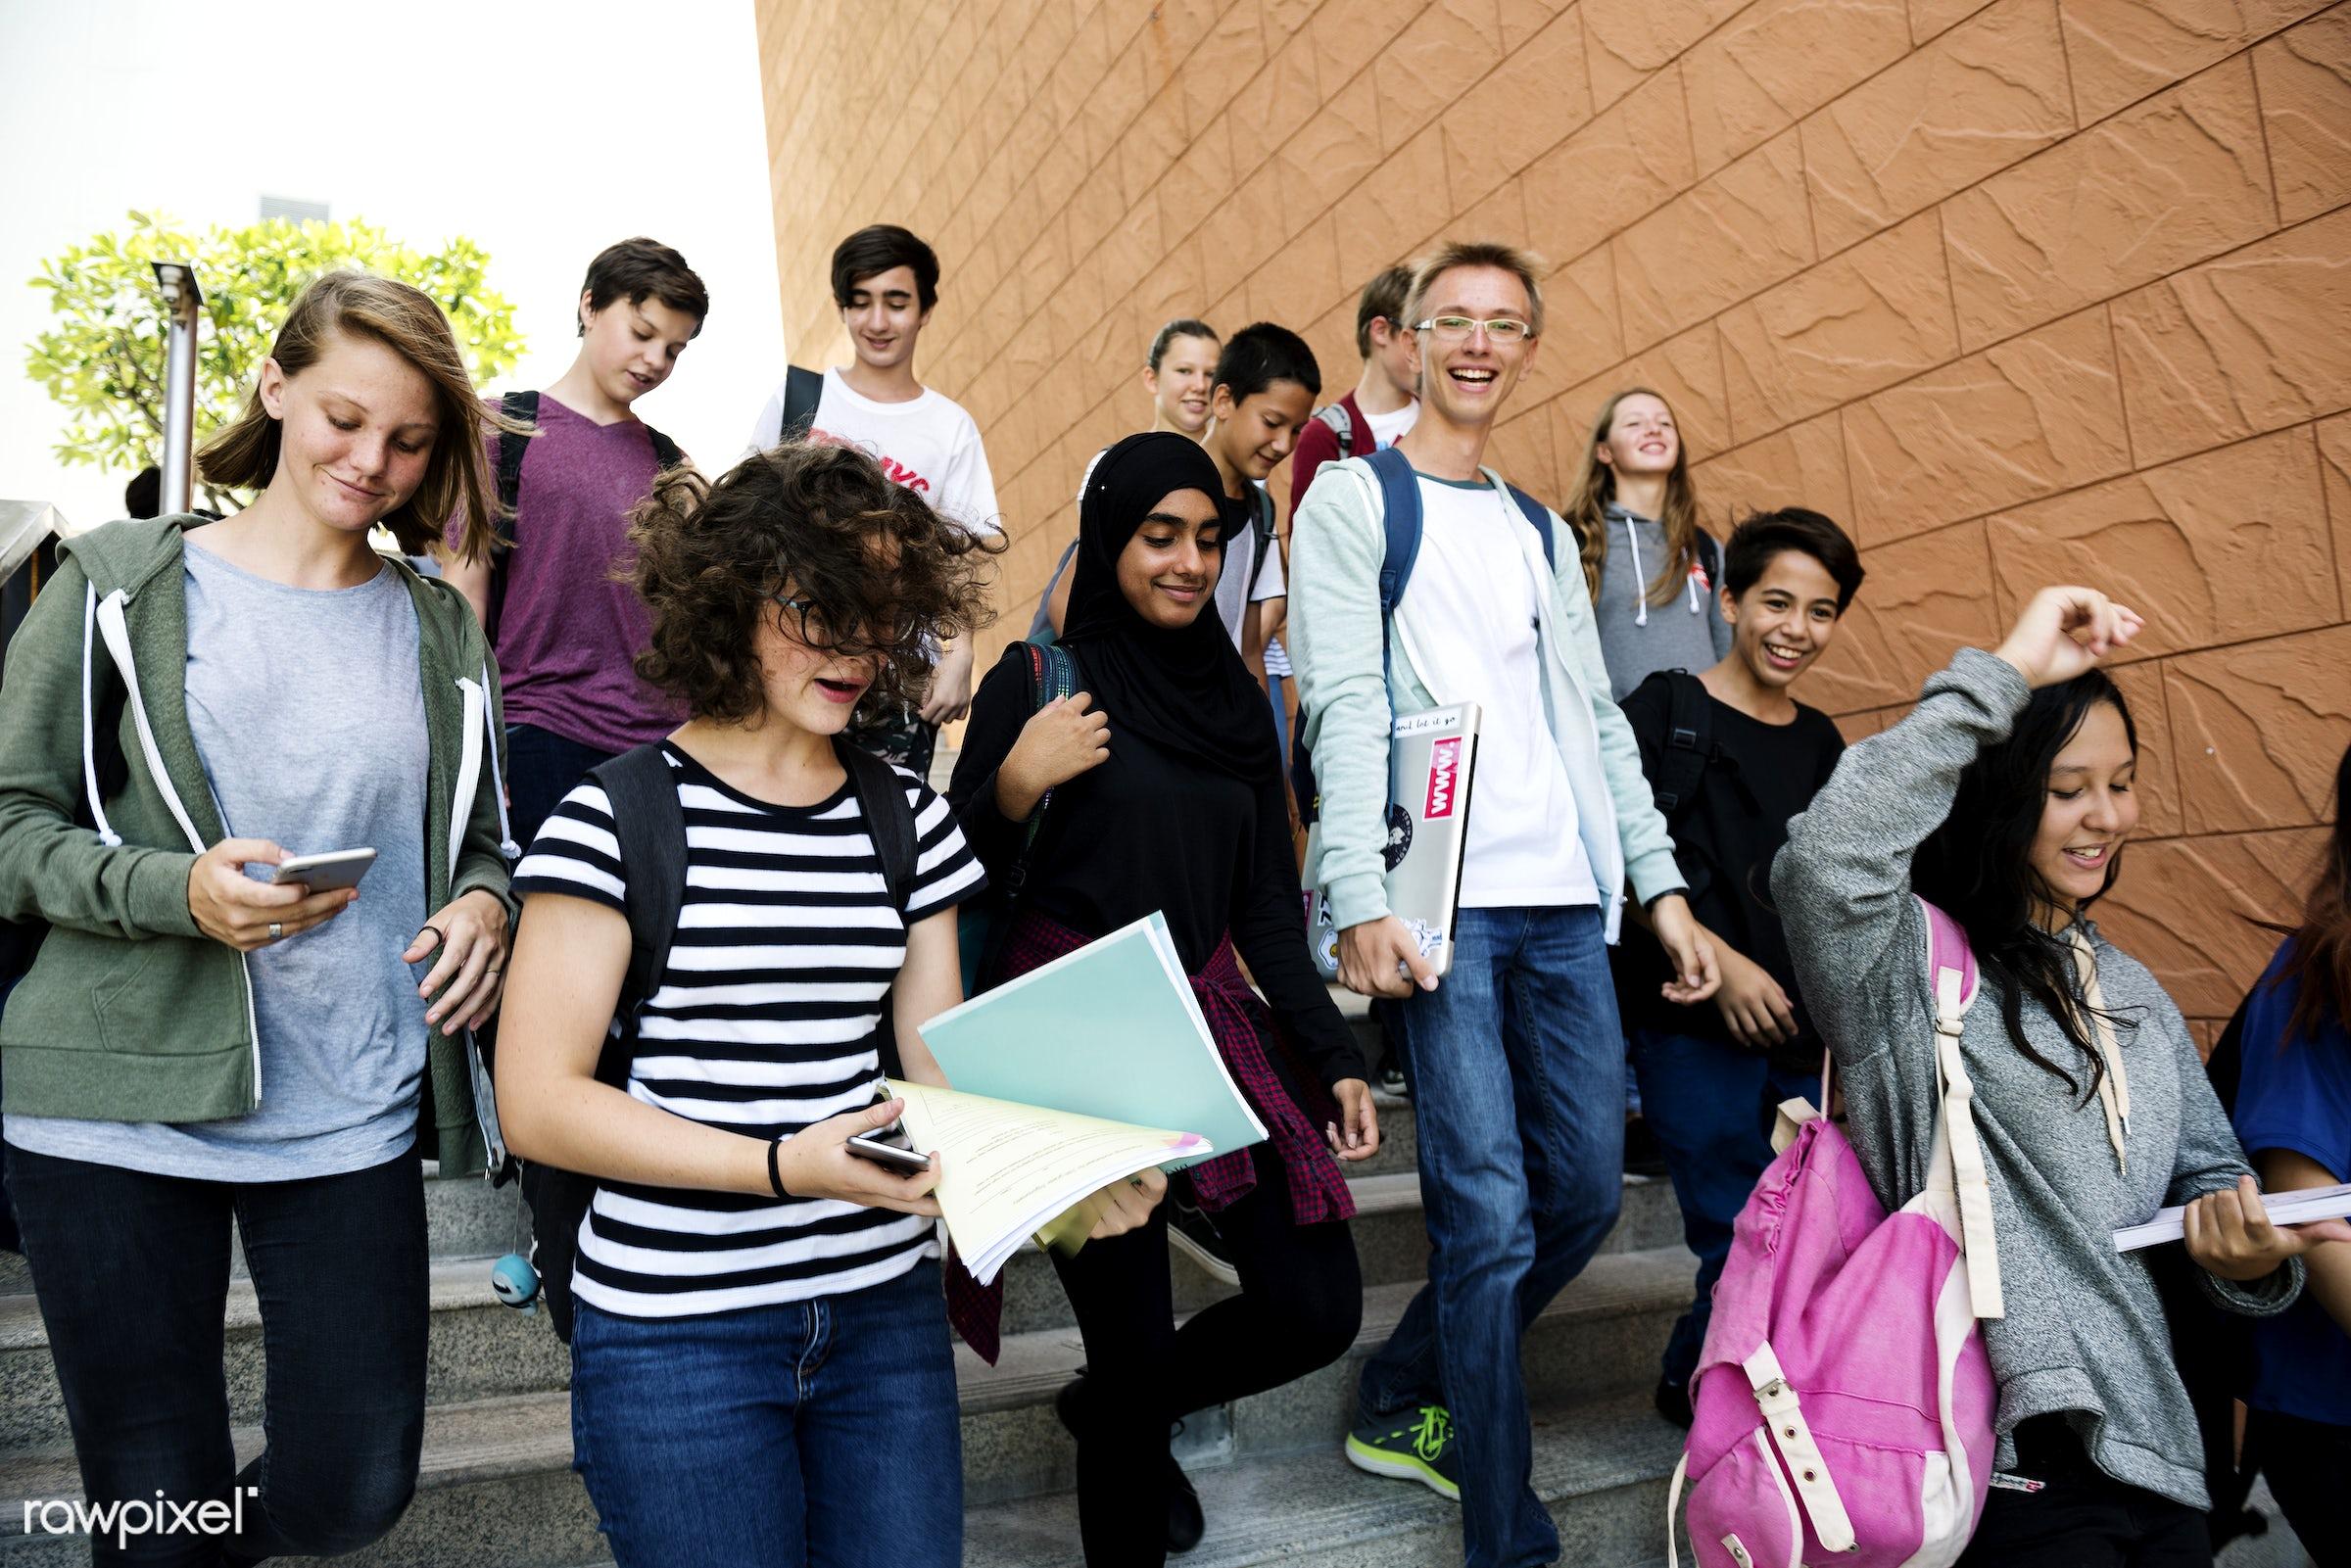 adolescent, arab, asian ethnicity, backpack, boys, candid, caucasian, classmates, diversity, education, friends, friendship...